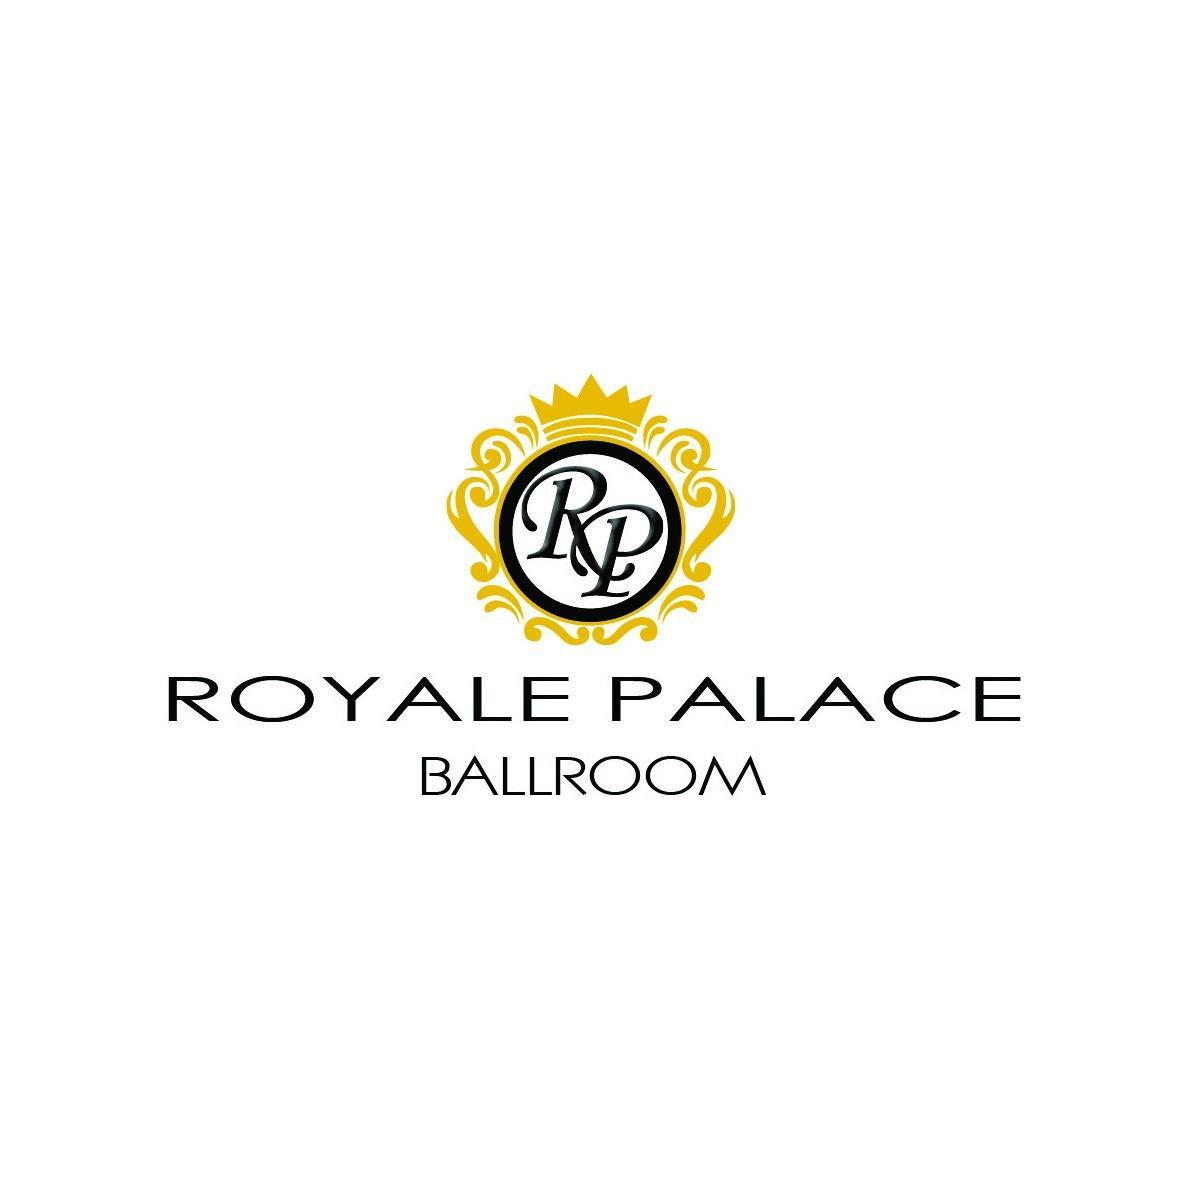 Royale Palace Ballroom